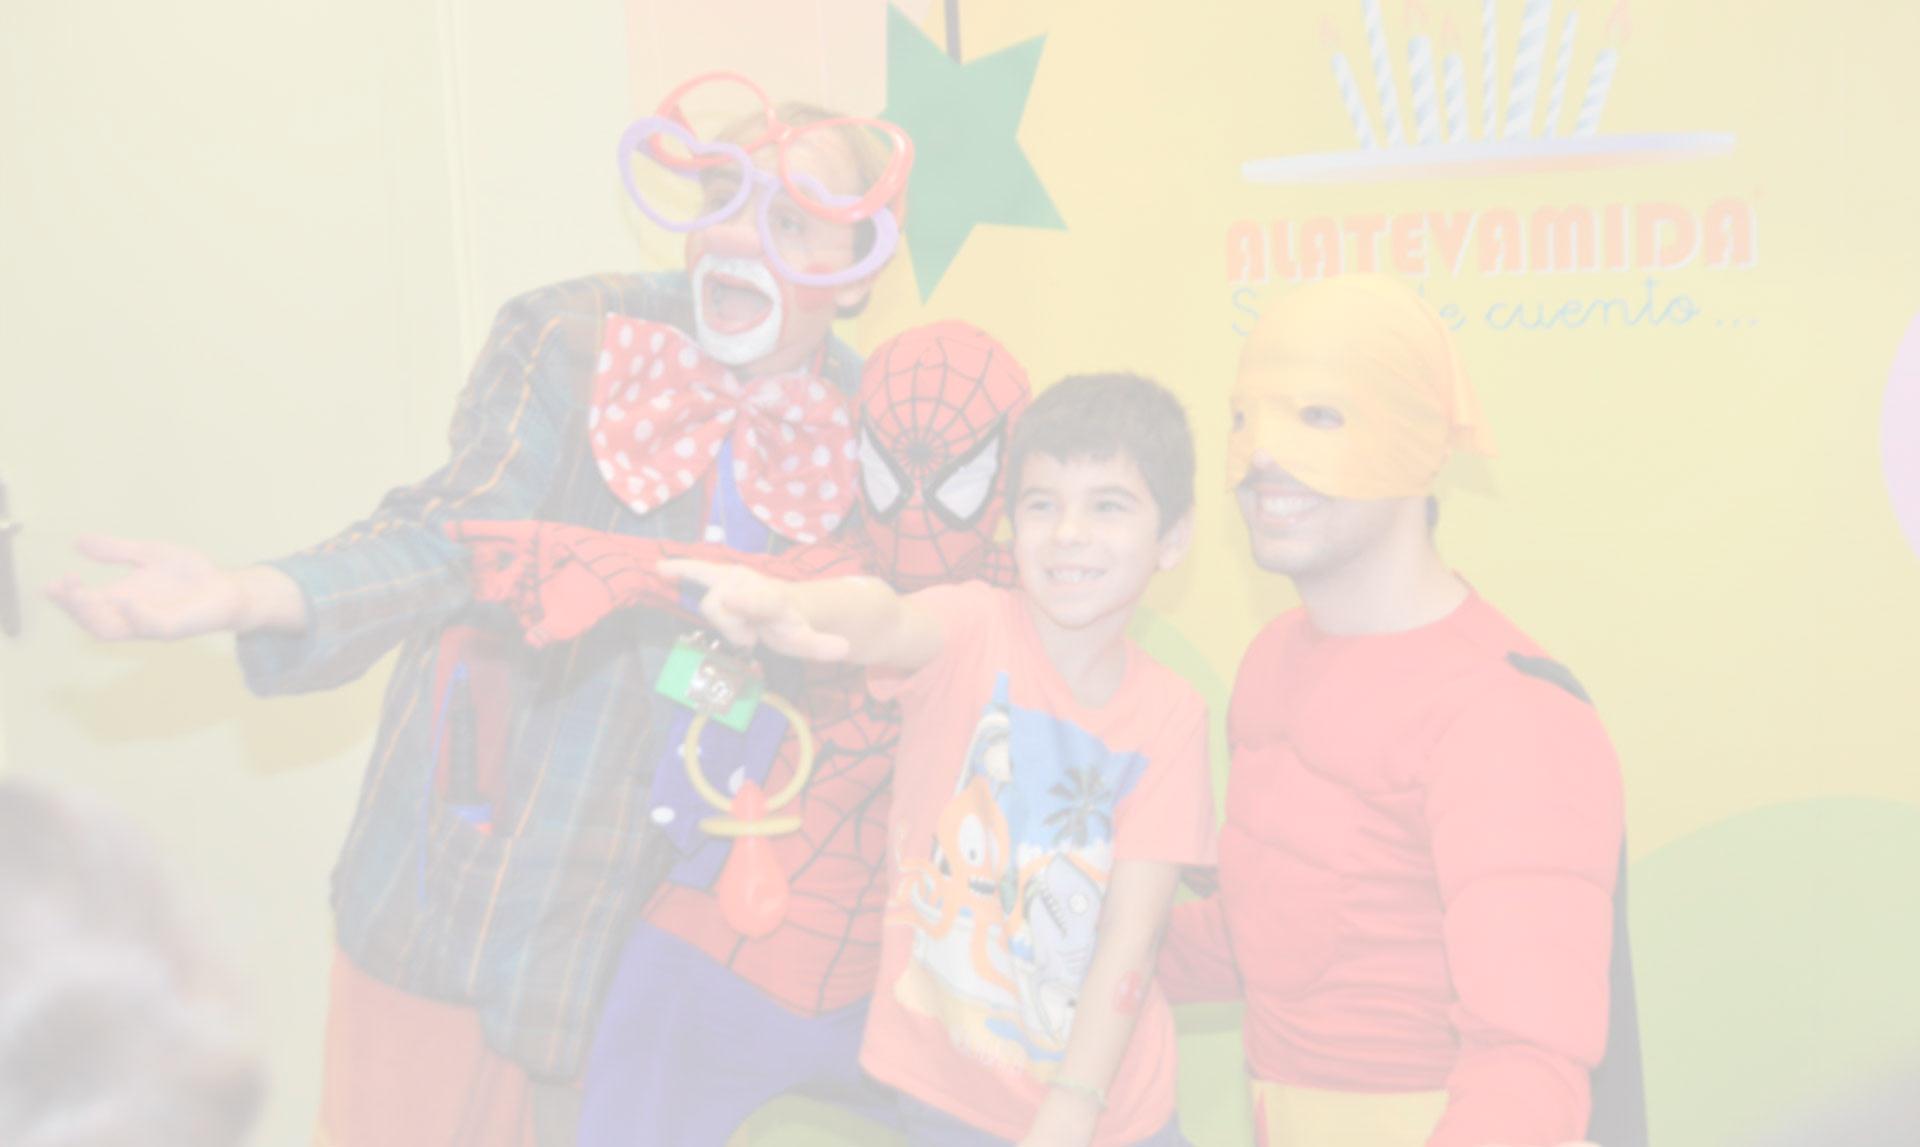 bg-home-superheroes-2 | Aeiou Kids club for children